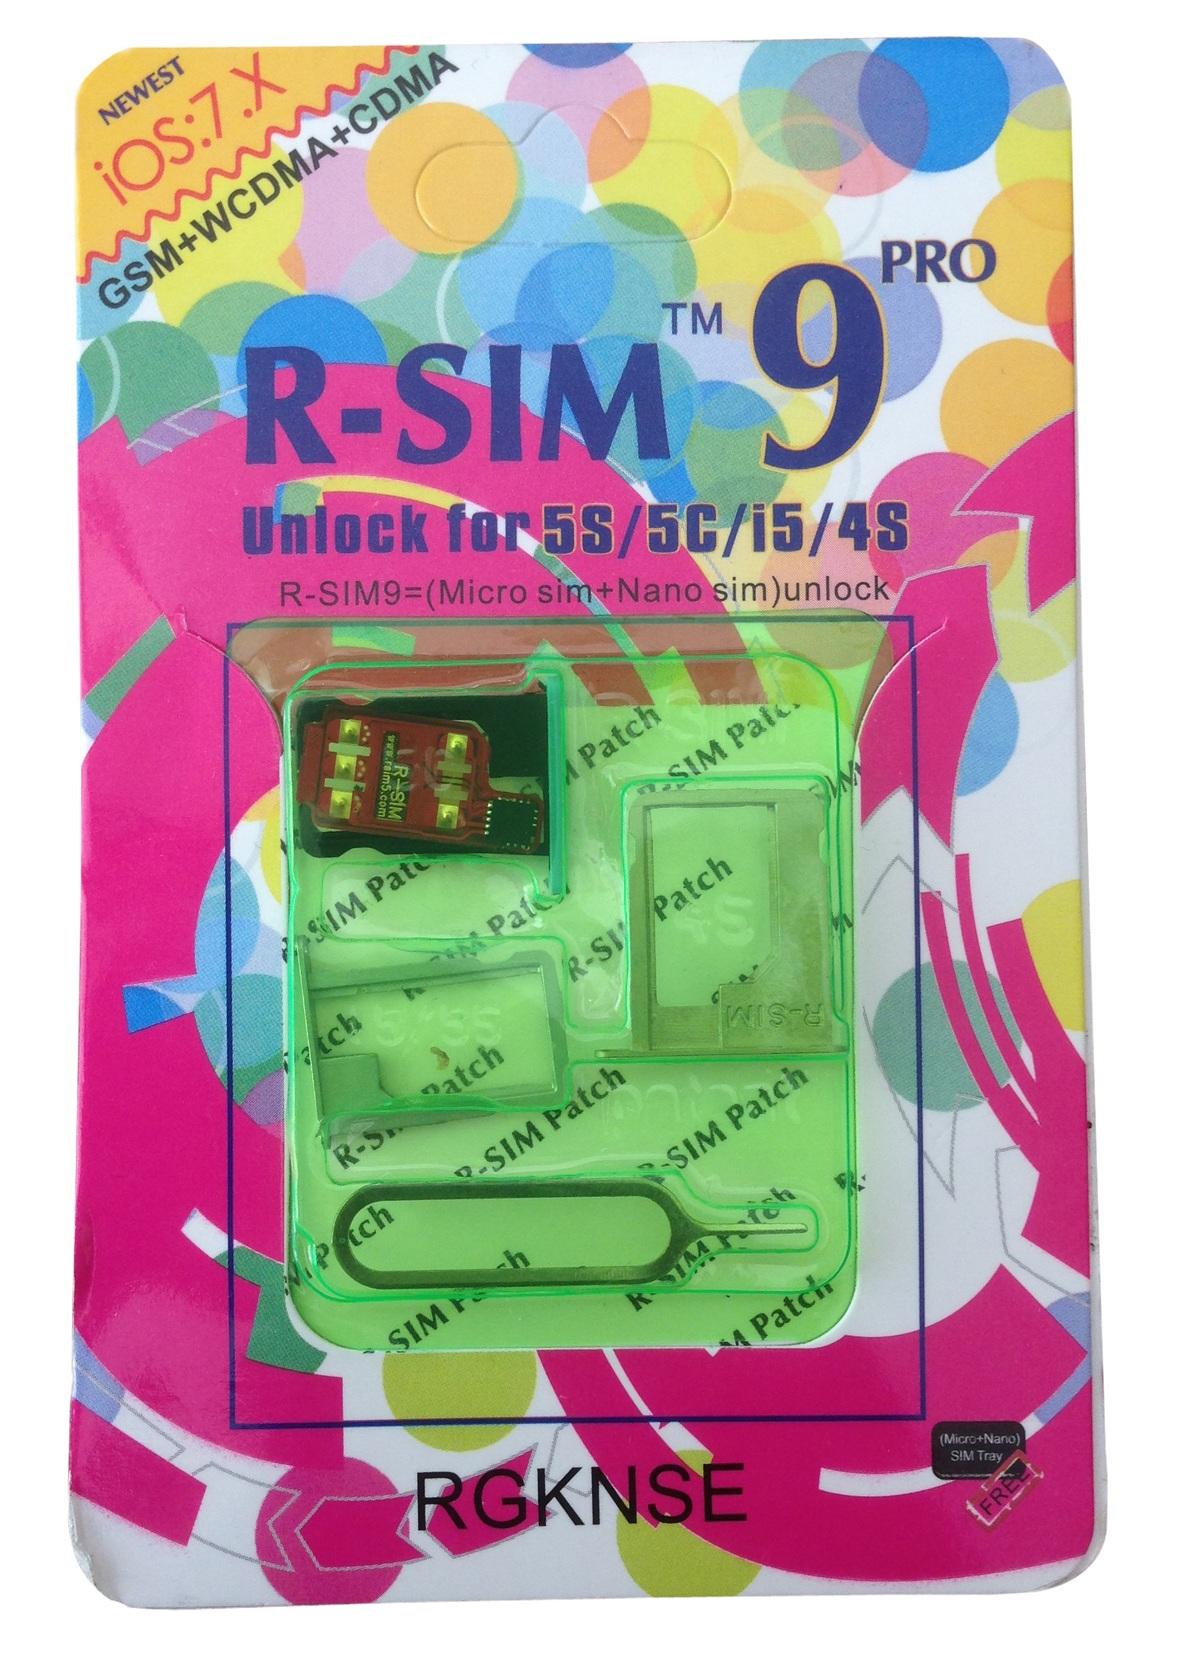 r_sim_9_pro.jpg